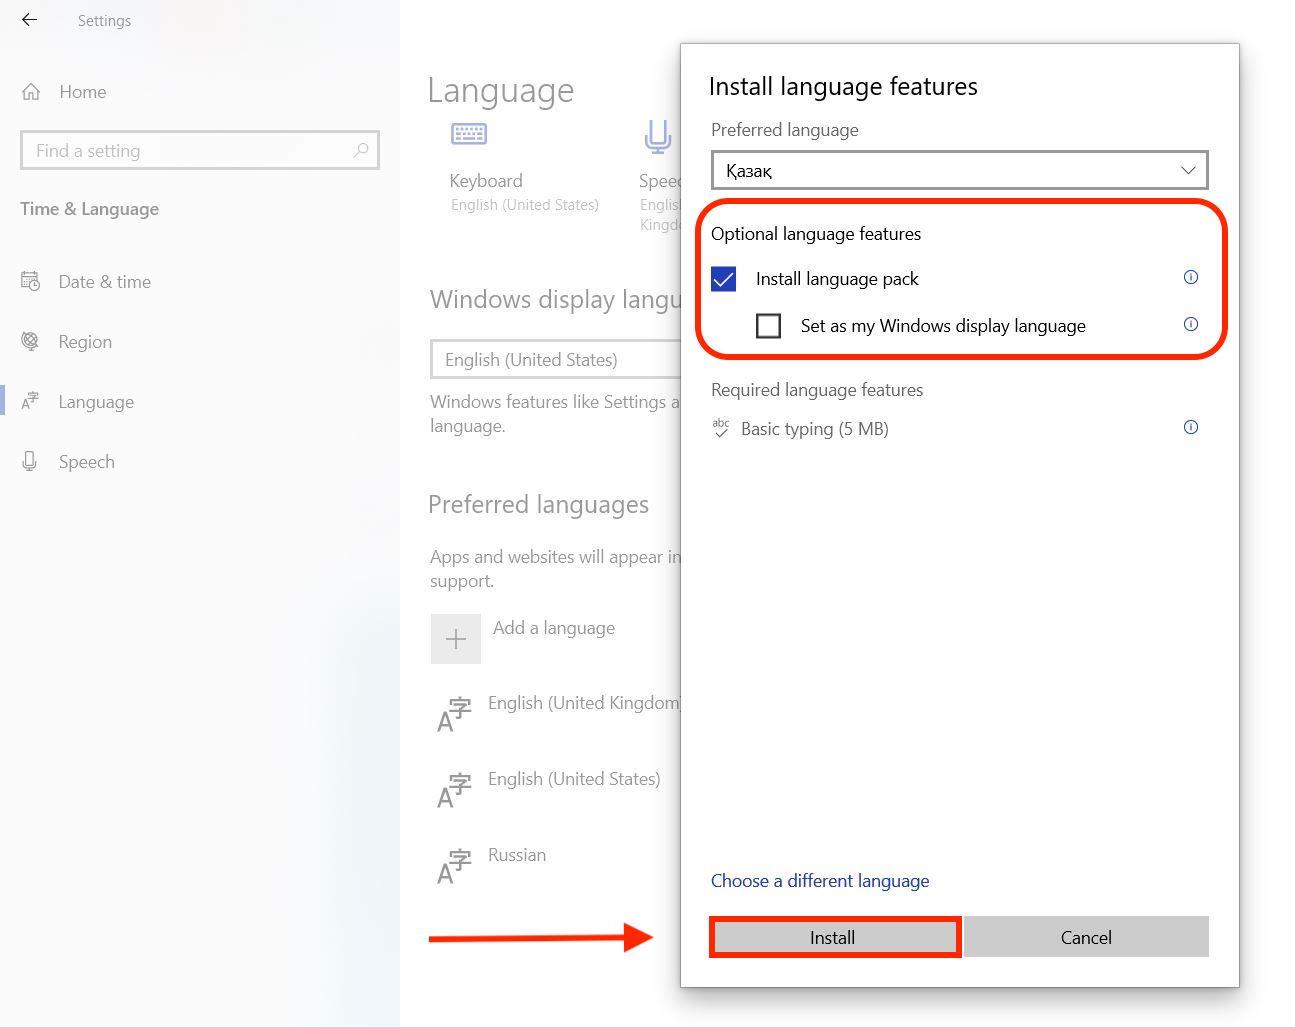 How to change keyboard language in Windows - install language pack